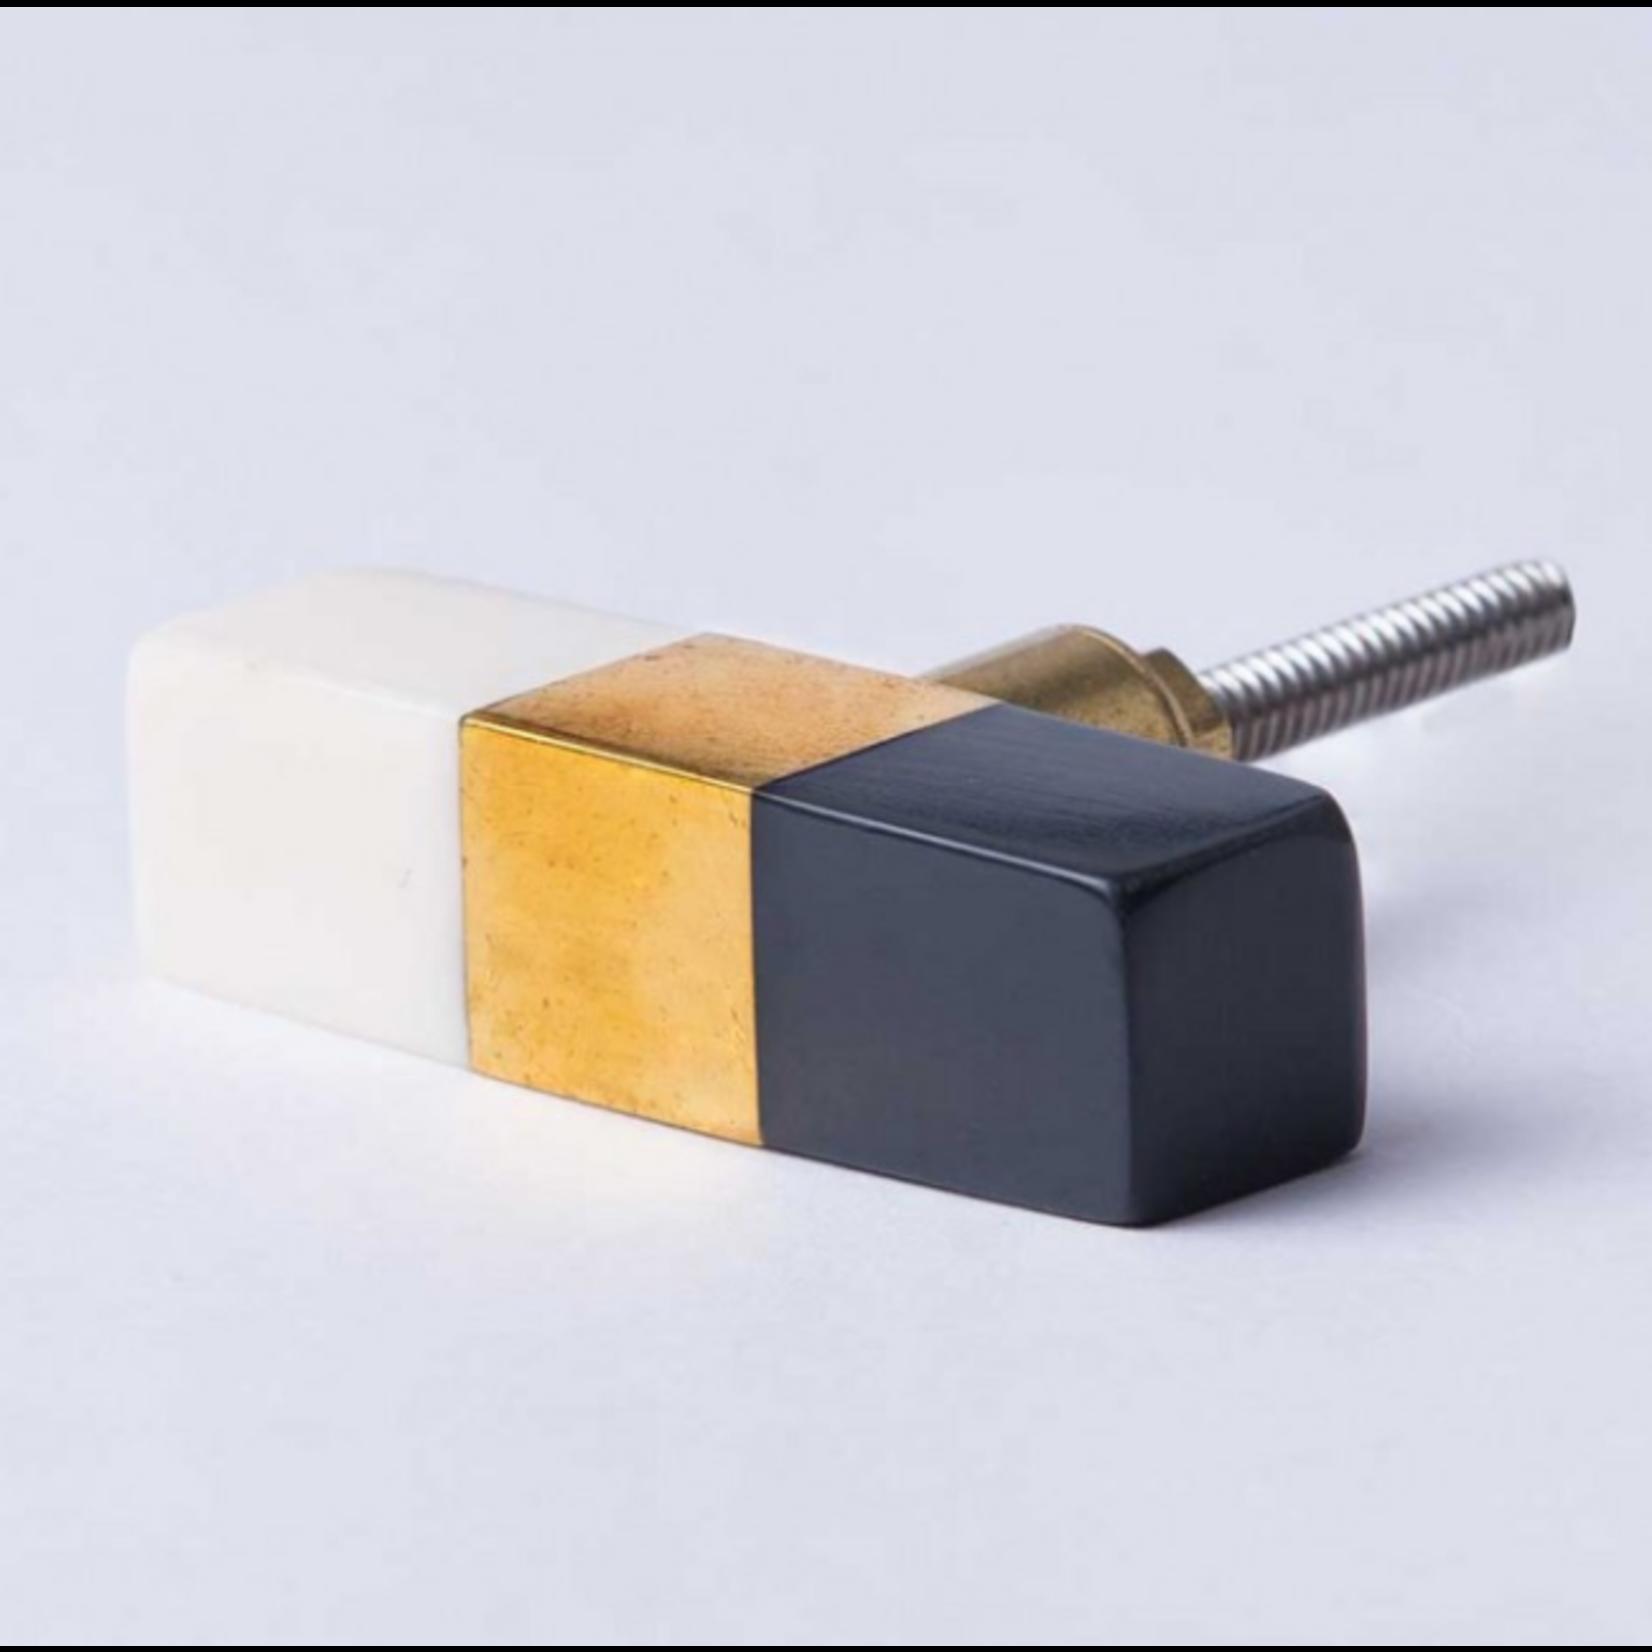 BoDuck Block Bar Knob Black/Brass/White Resin